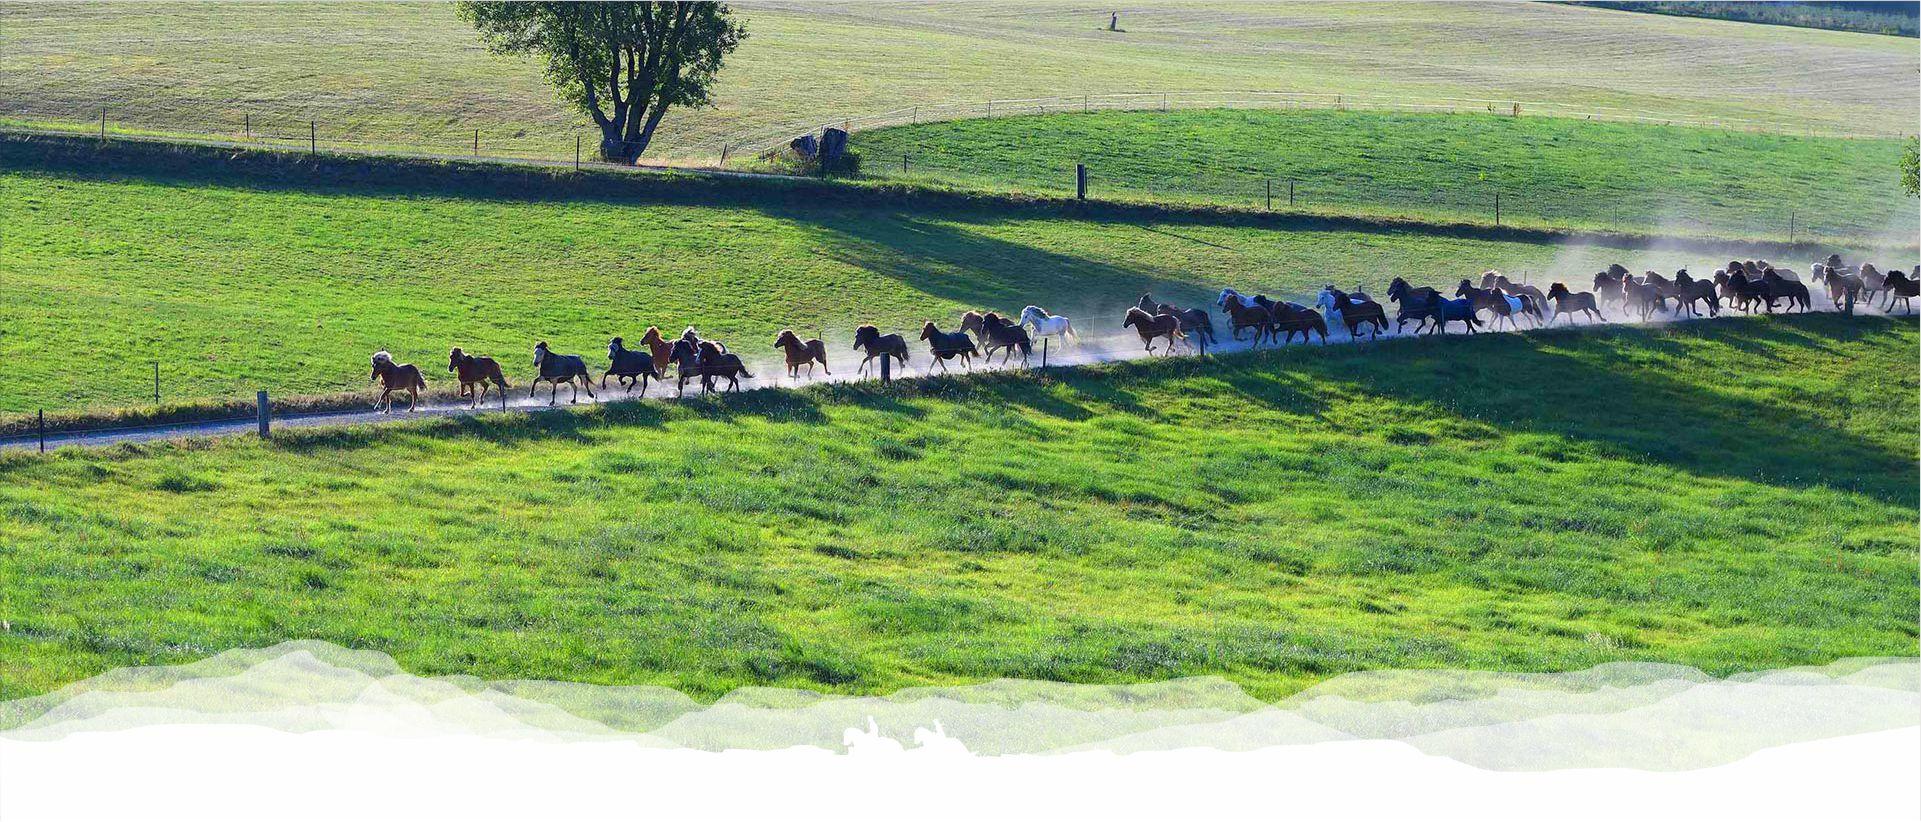 reitschule_berger_pensionspferde_002